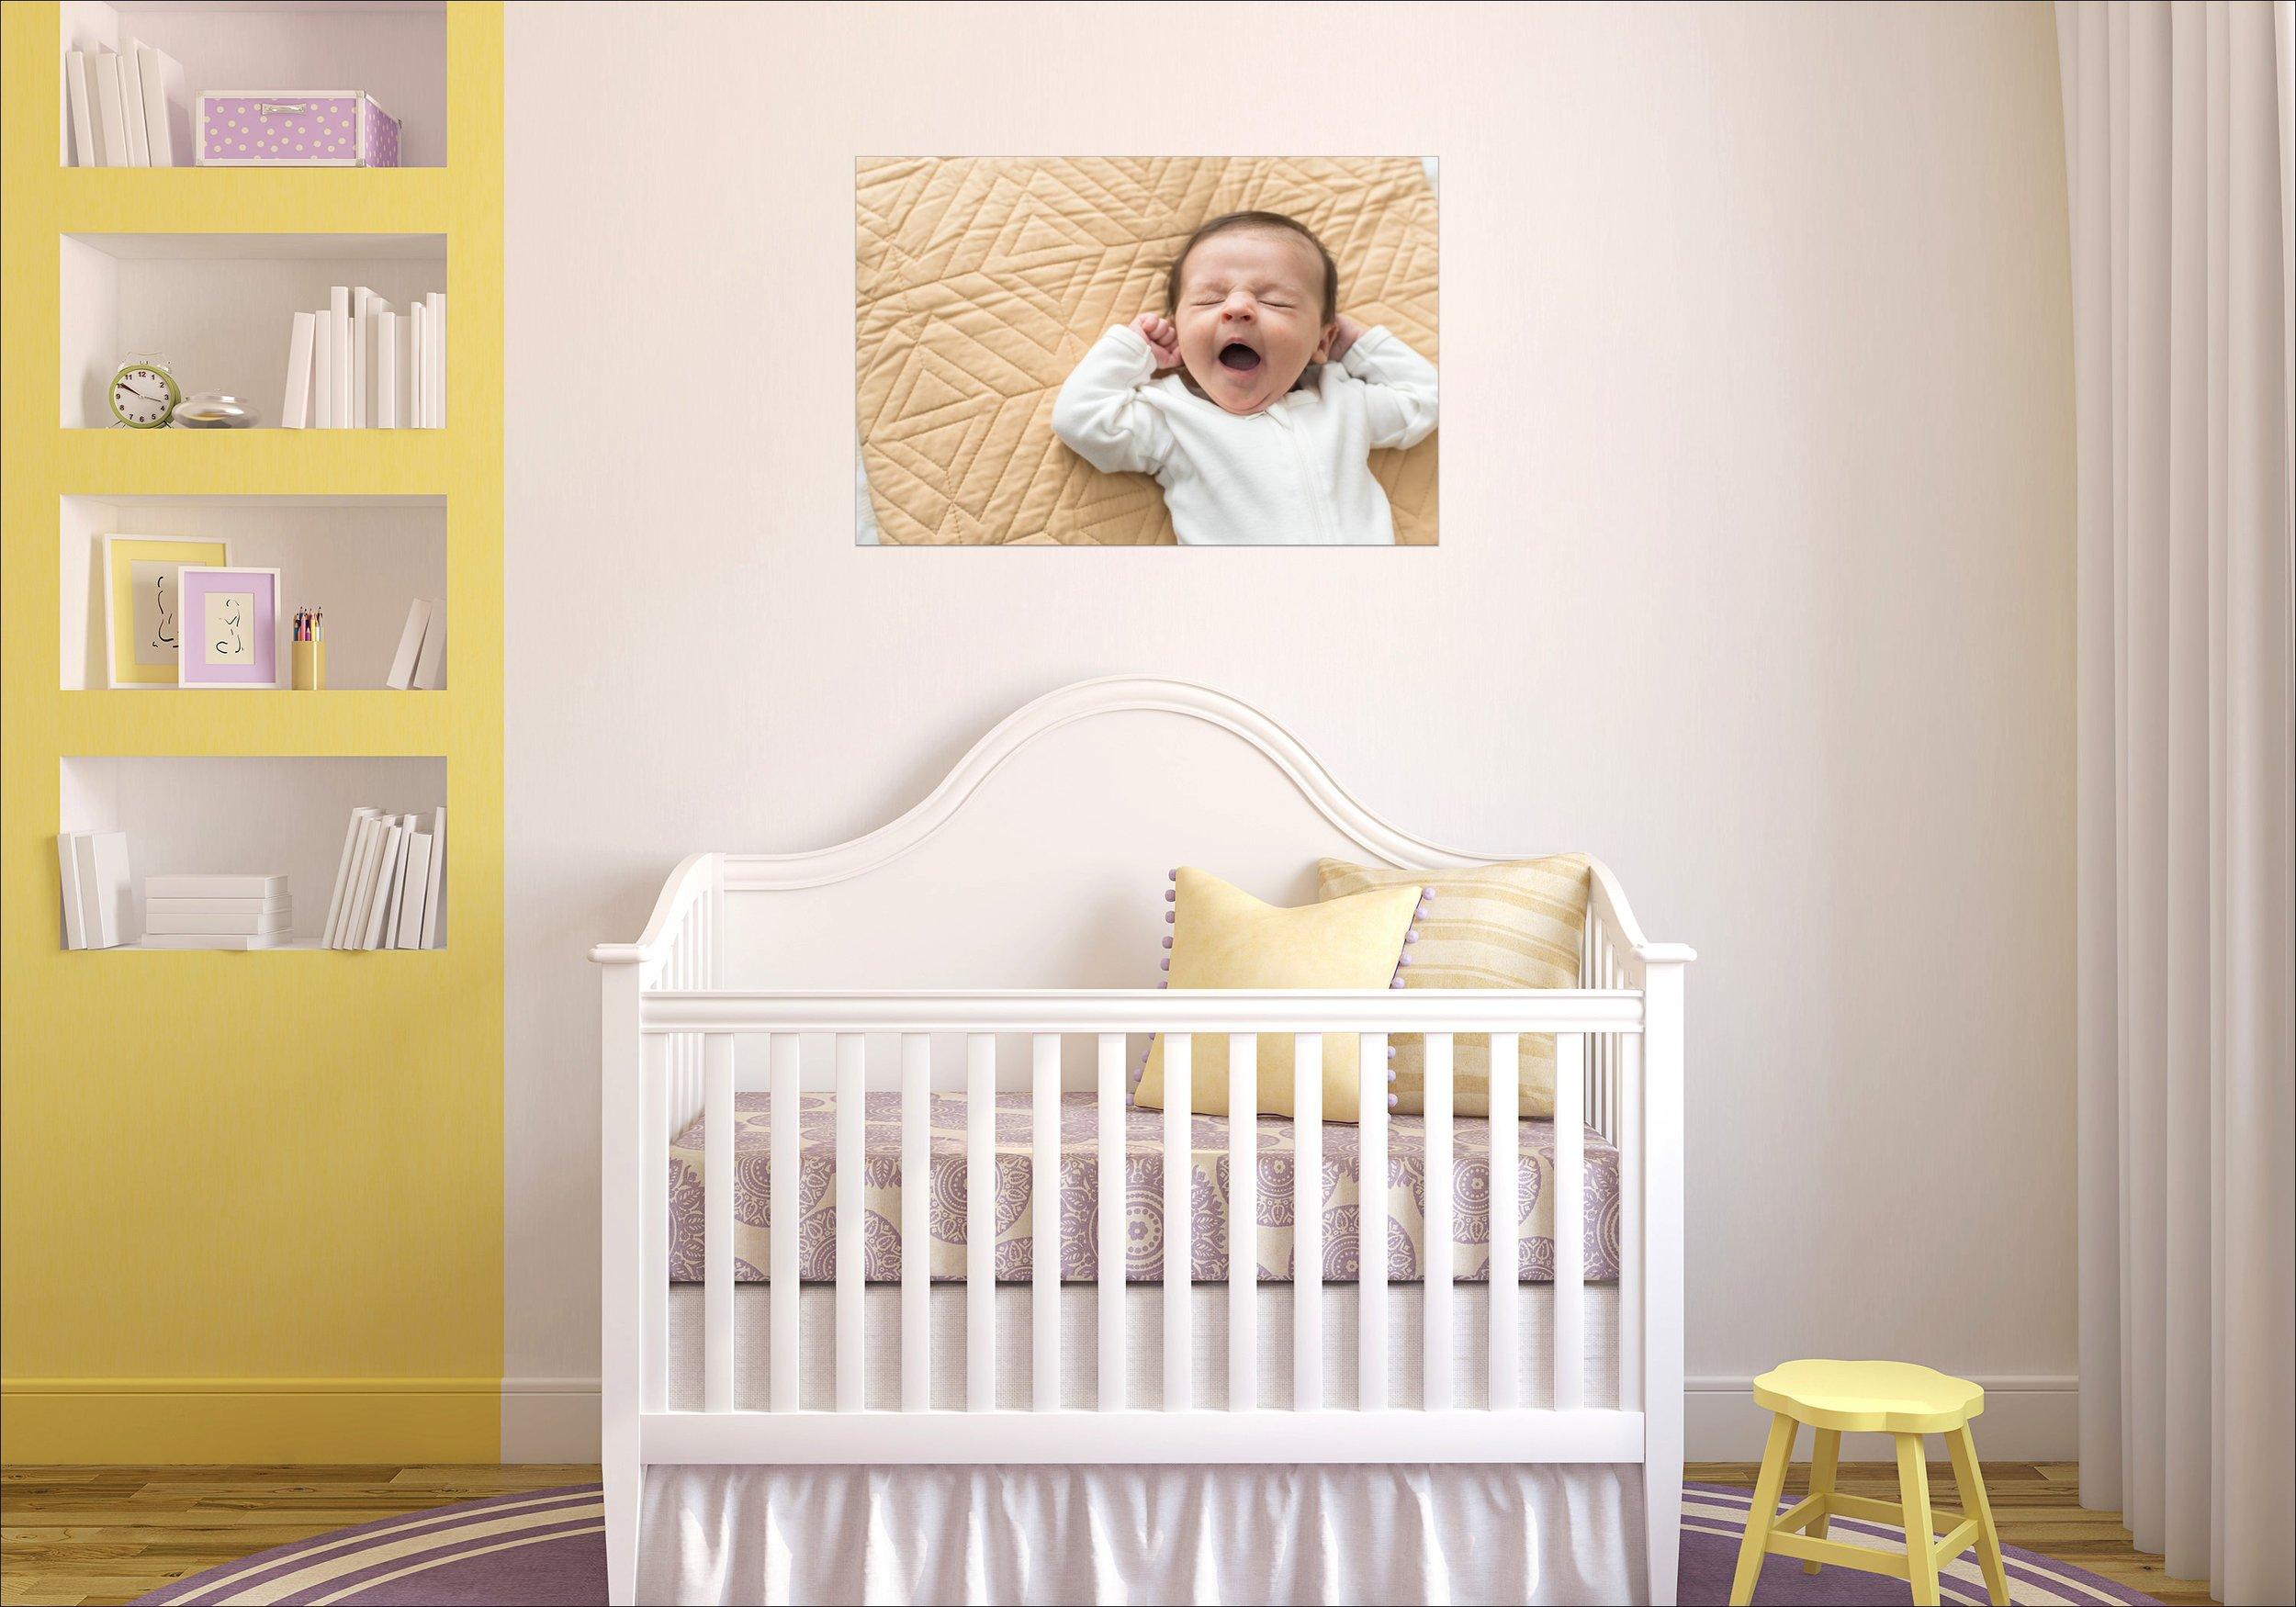 newborn wall display | full service Montgomery County pa photographer